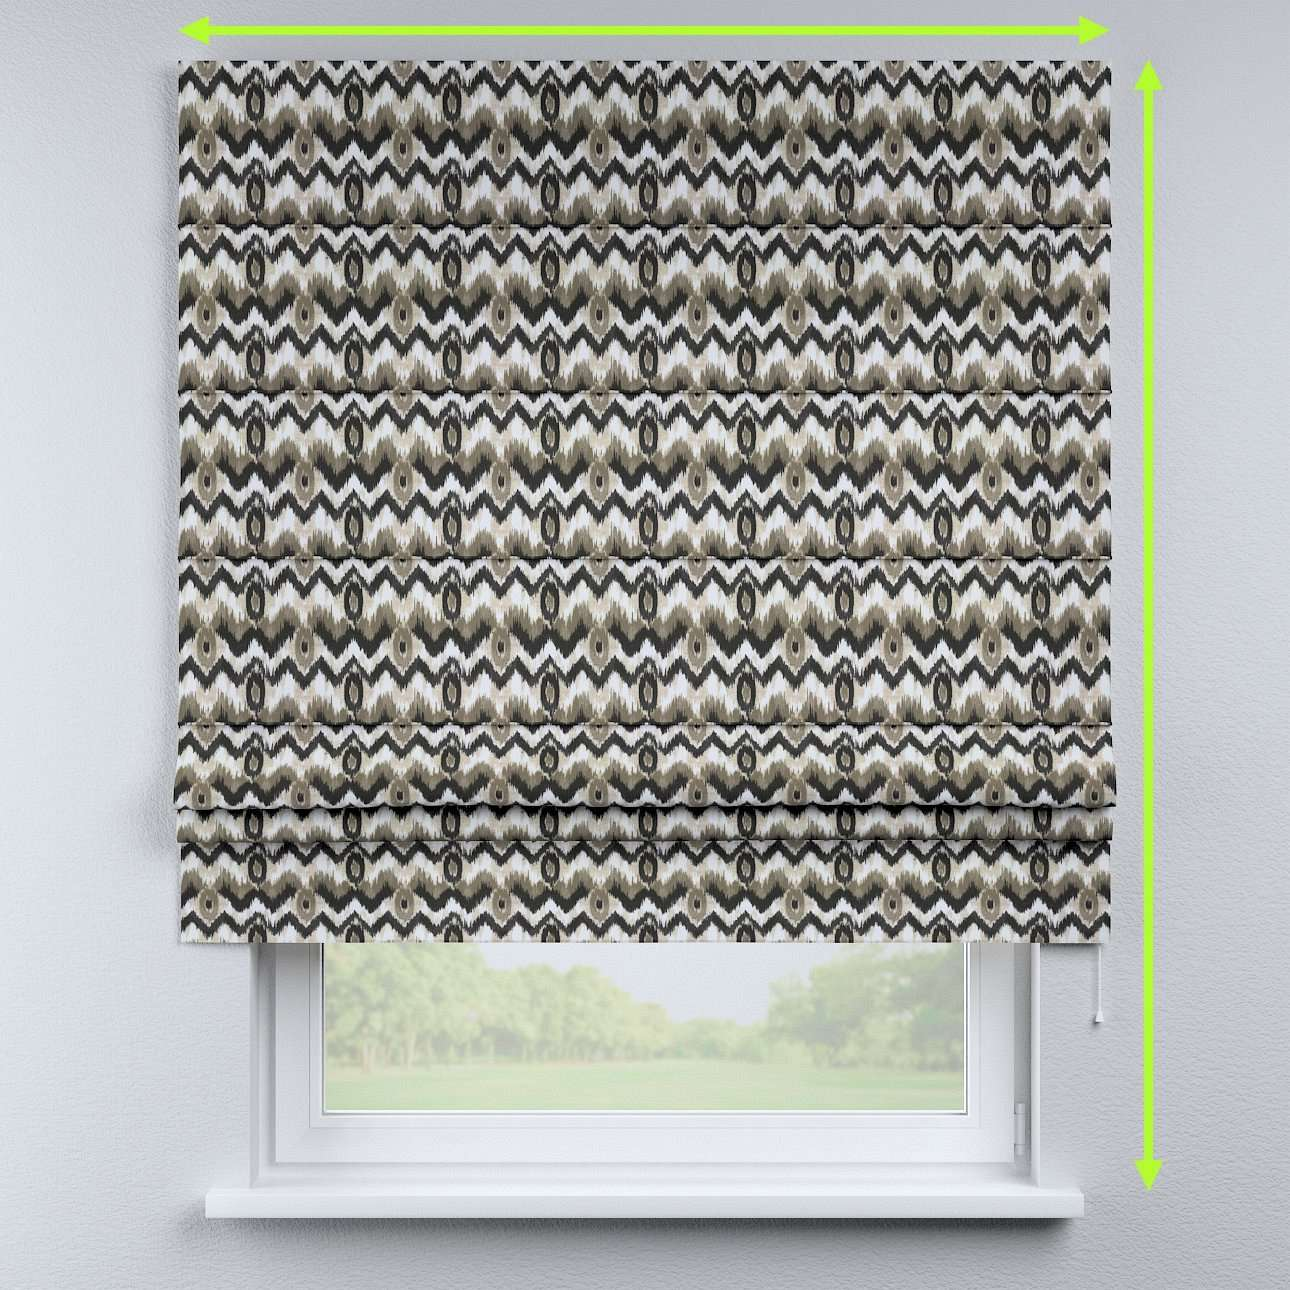 Padva roman blind in collection Modern, fabric: 141-88